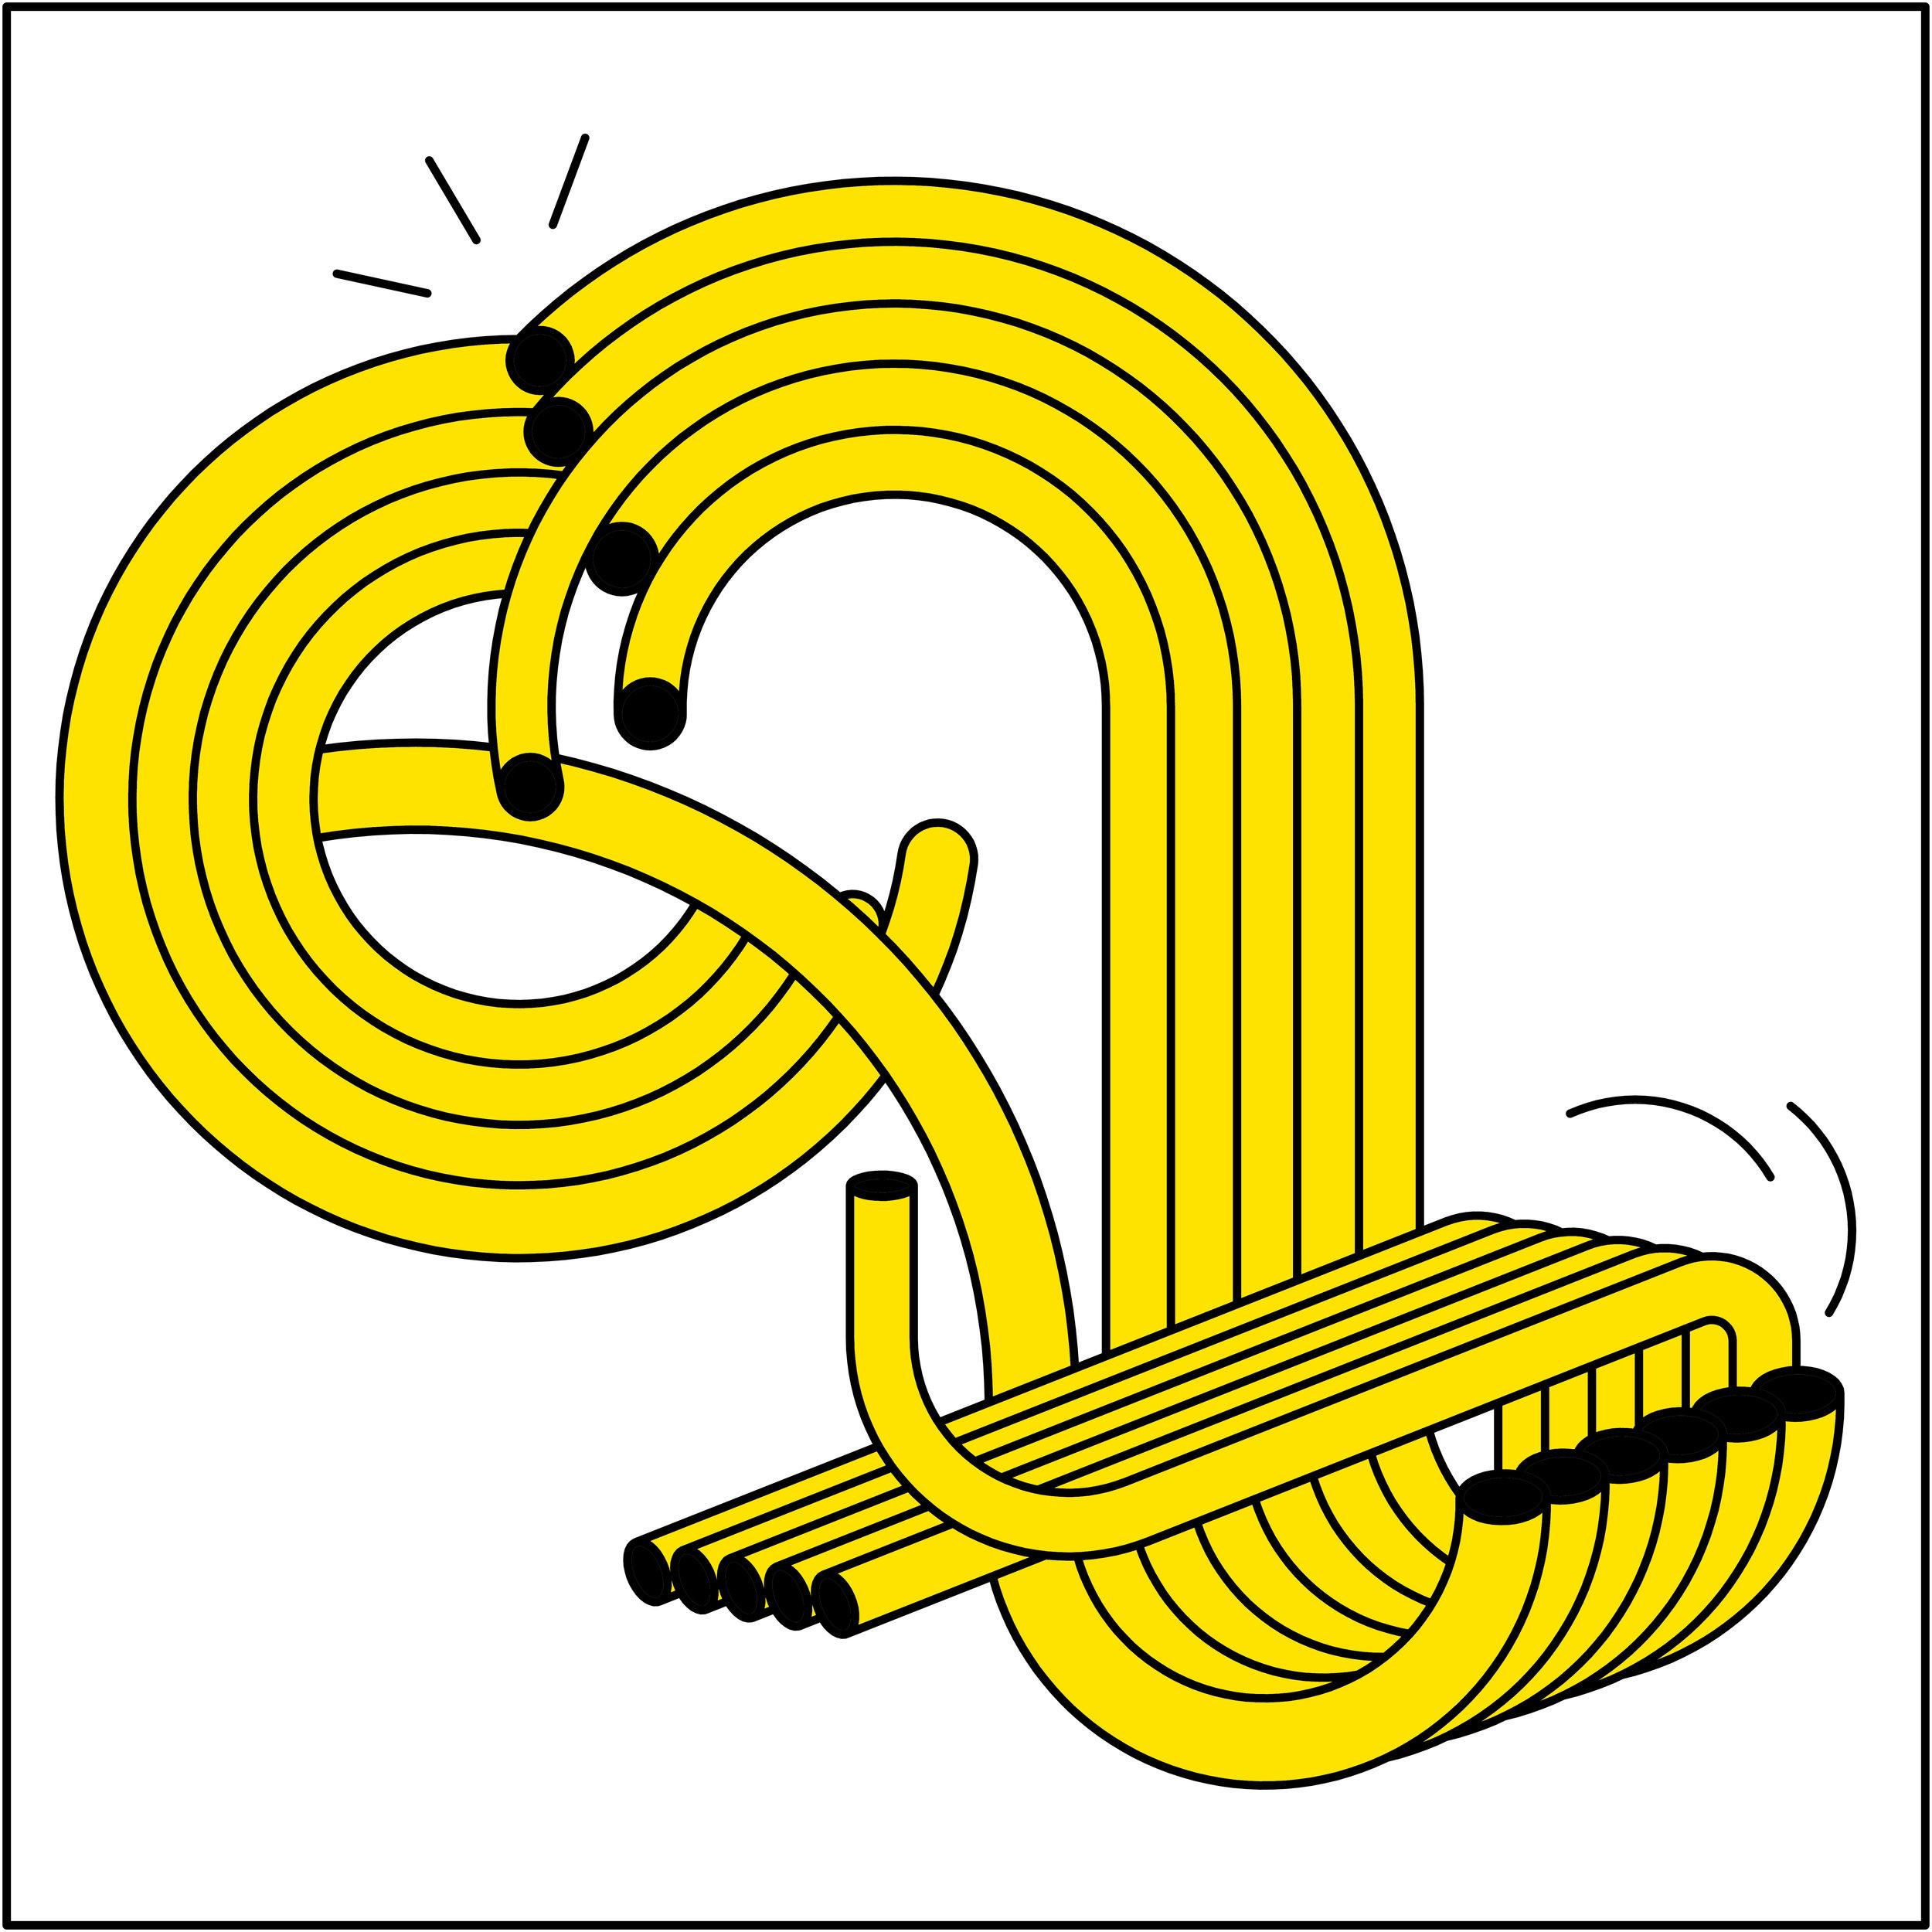 spaghetti yellow - 023.jpg